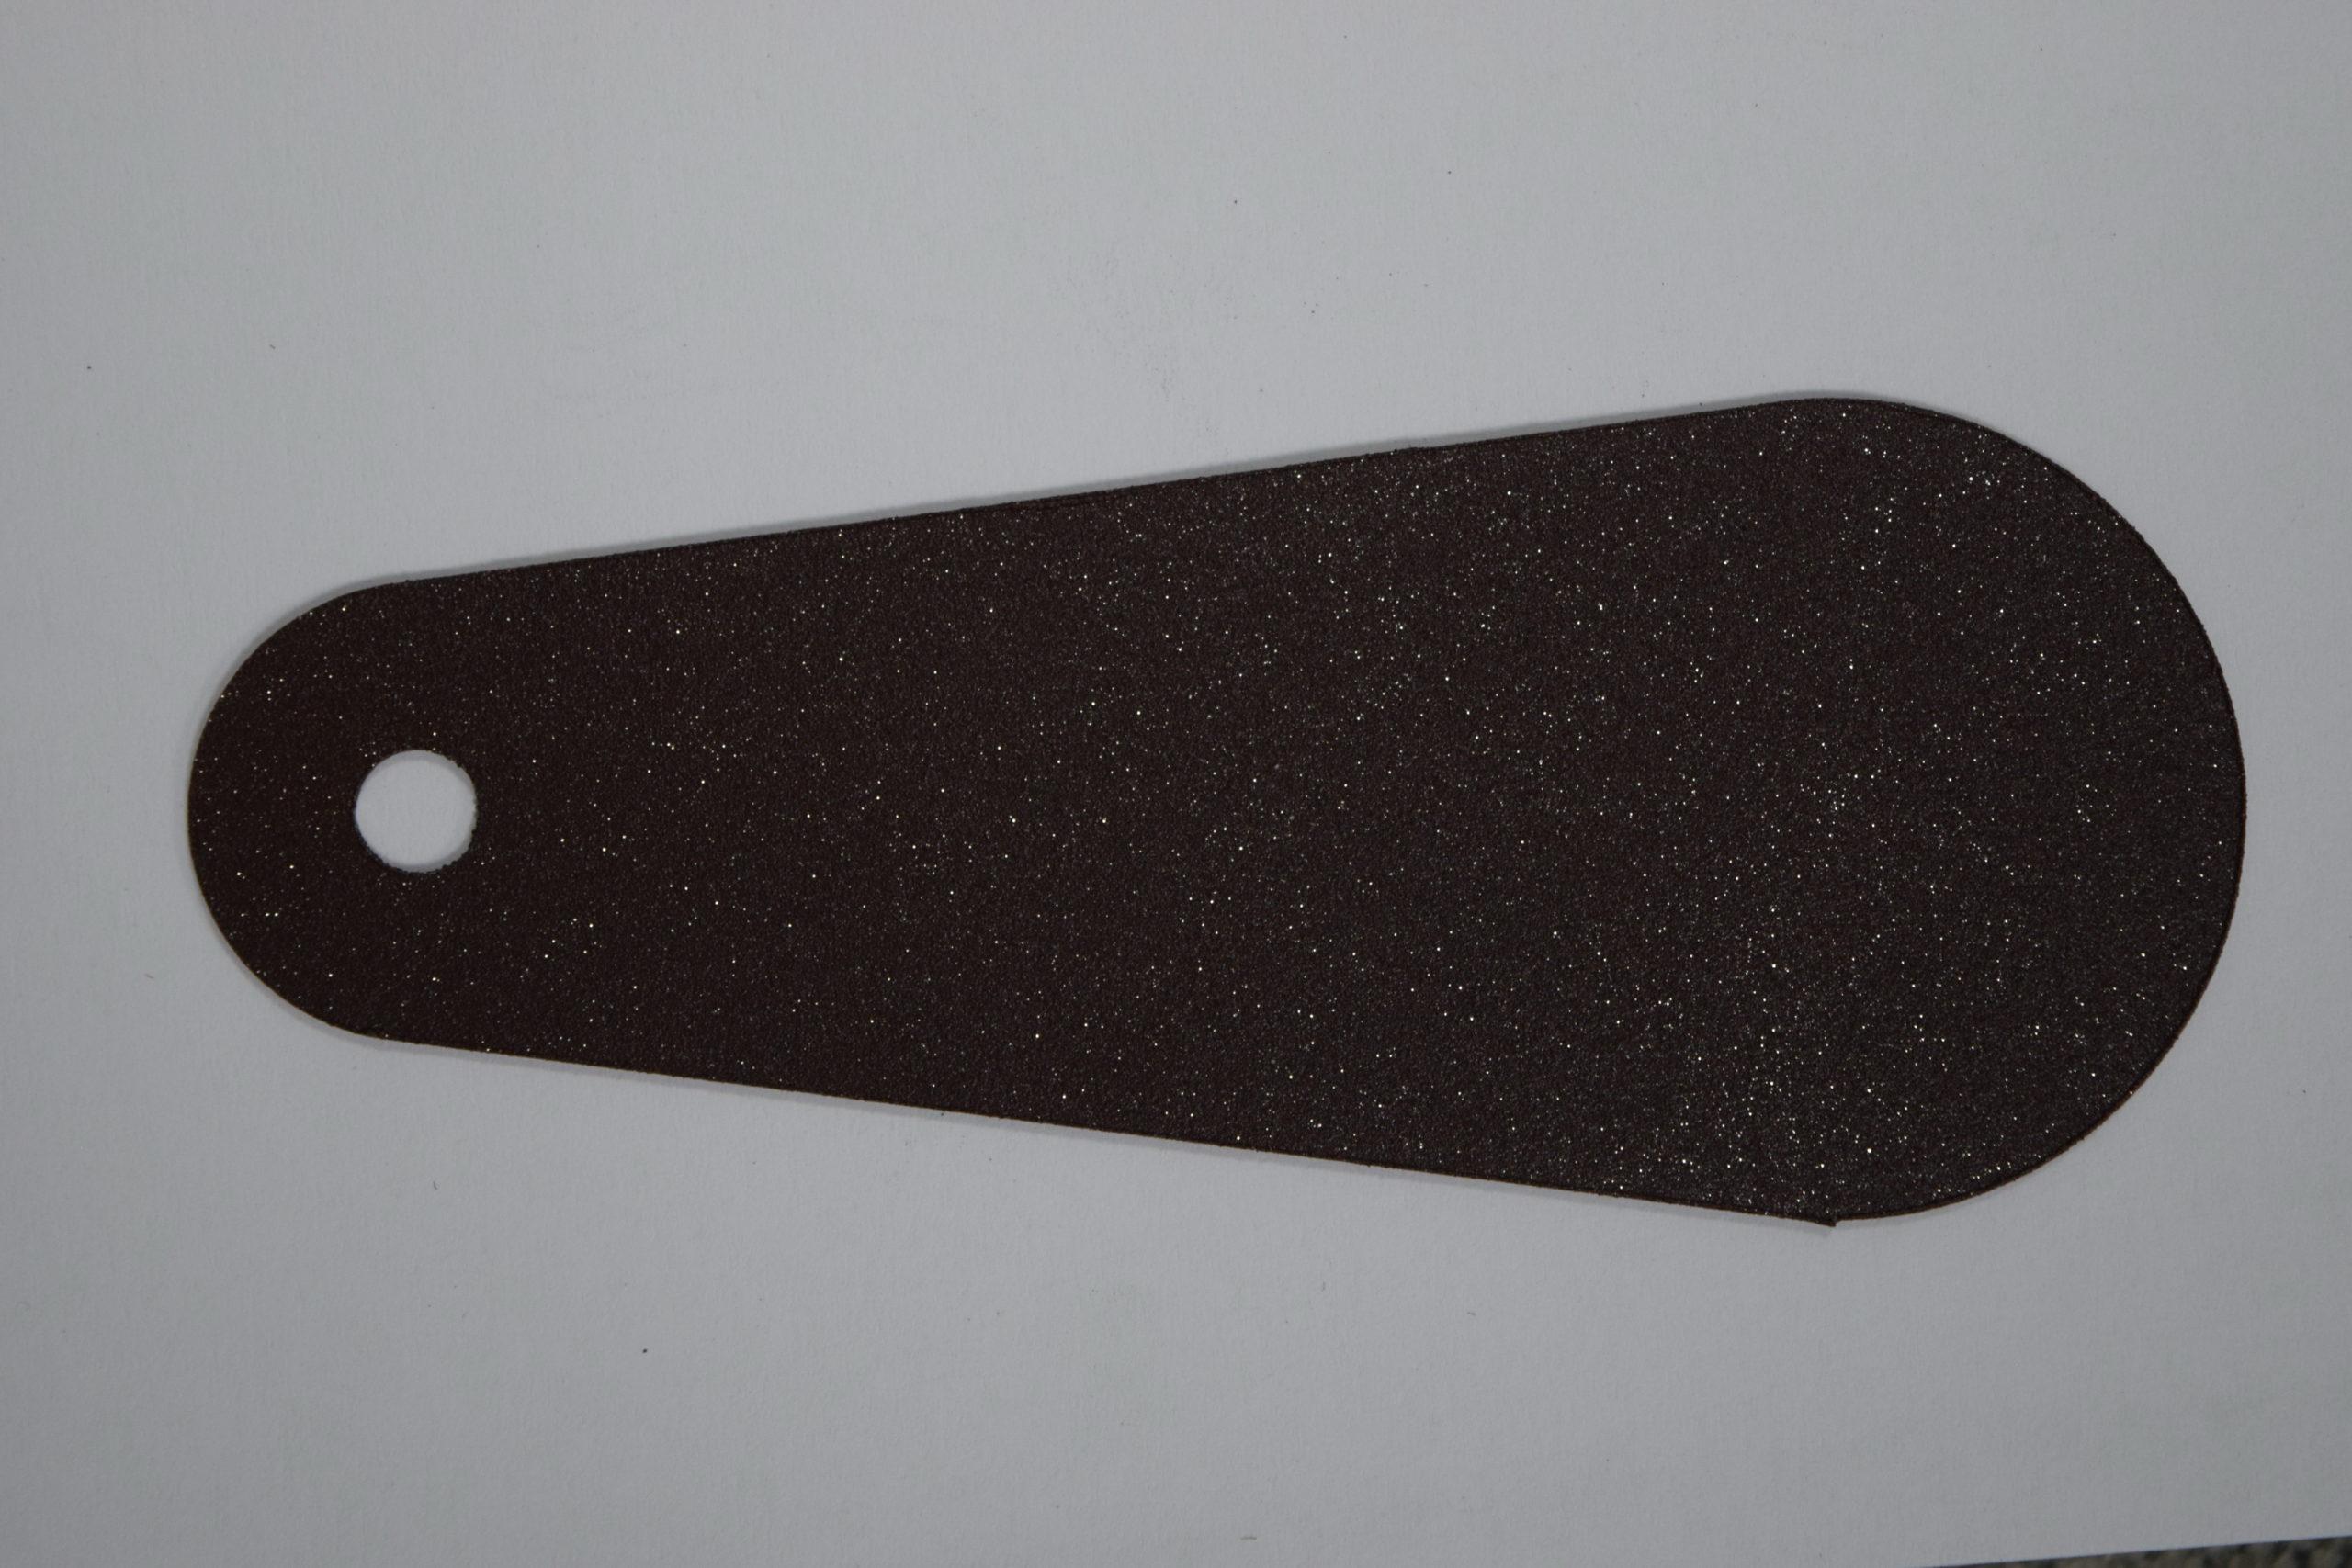 8017 Порошковая краска П-ПЛ-1015-4 ИПВ RAL 8017(муар-металлик)/20кг